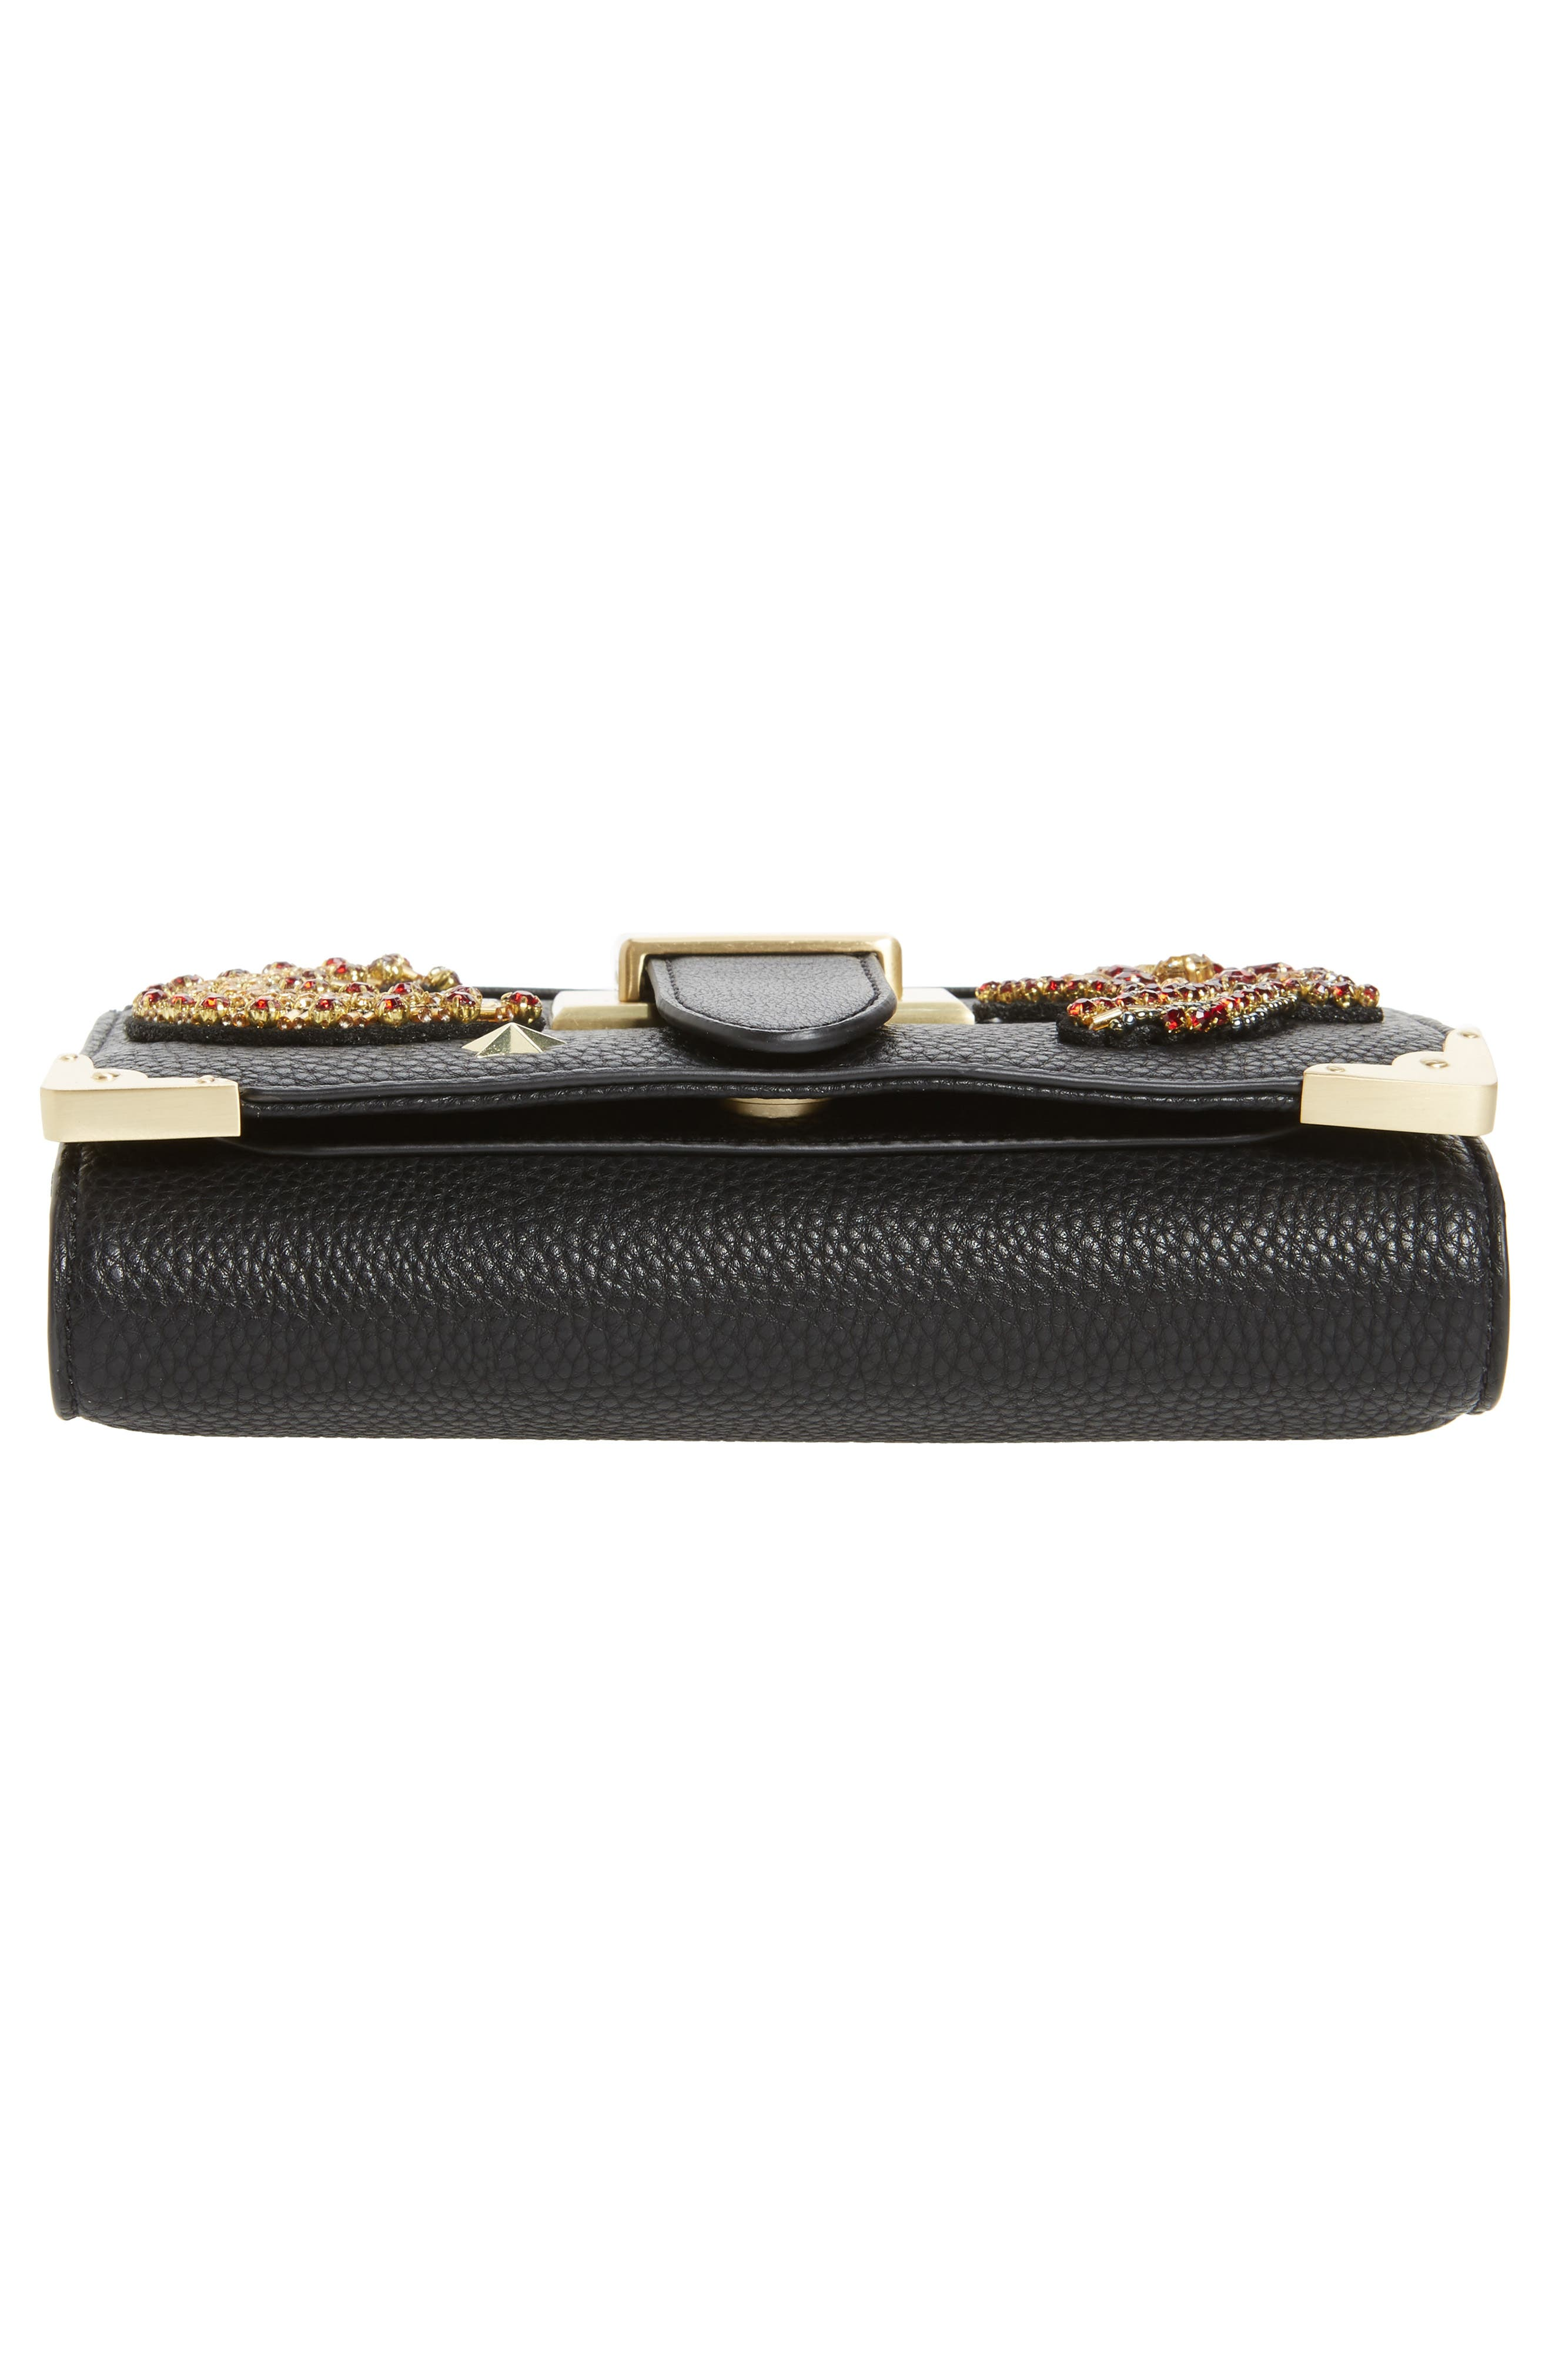 Florence Faux Leather Clutch Wallet,                             Alternate thumbnail 6, color,                             001